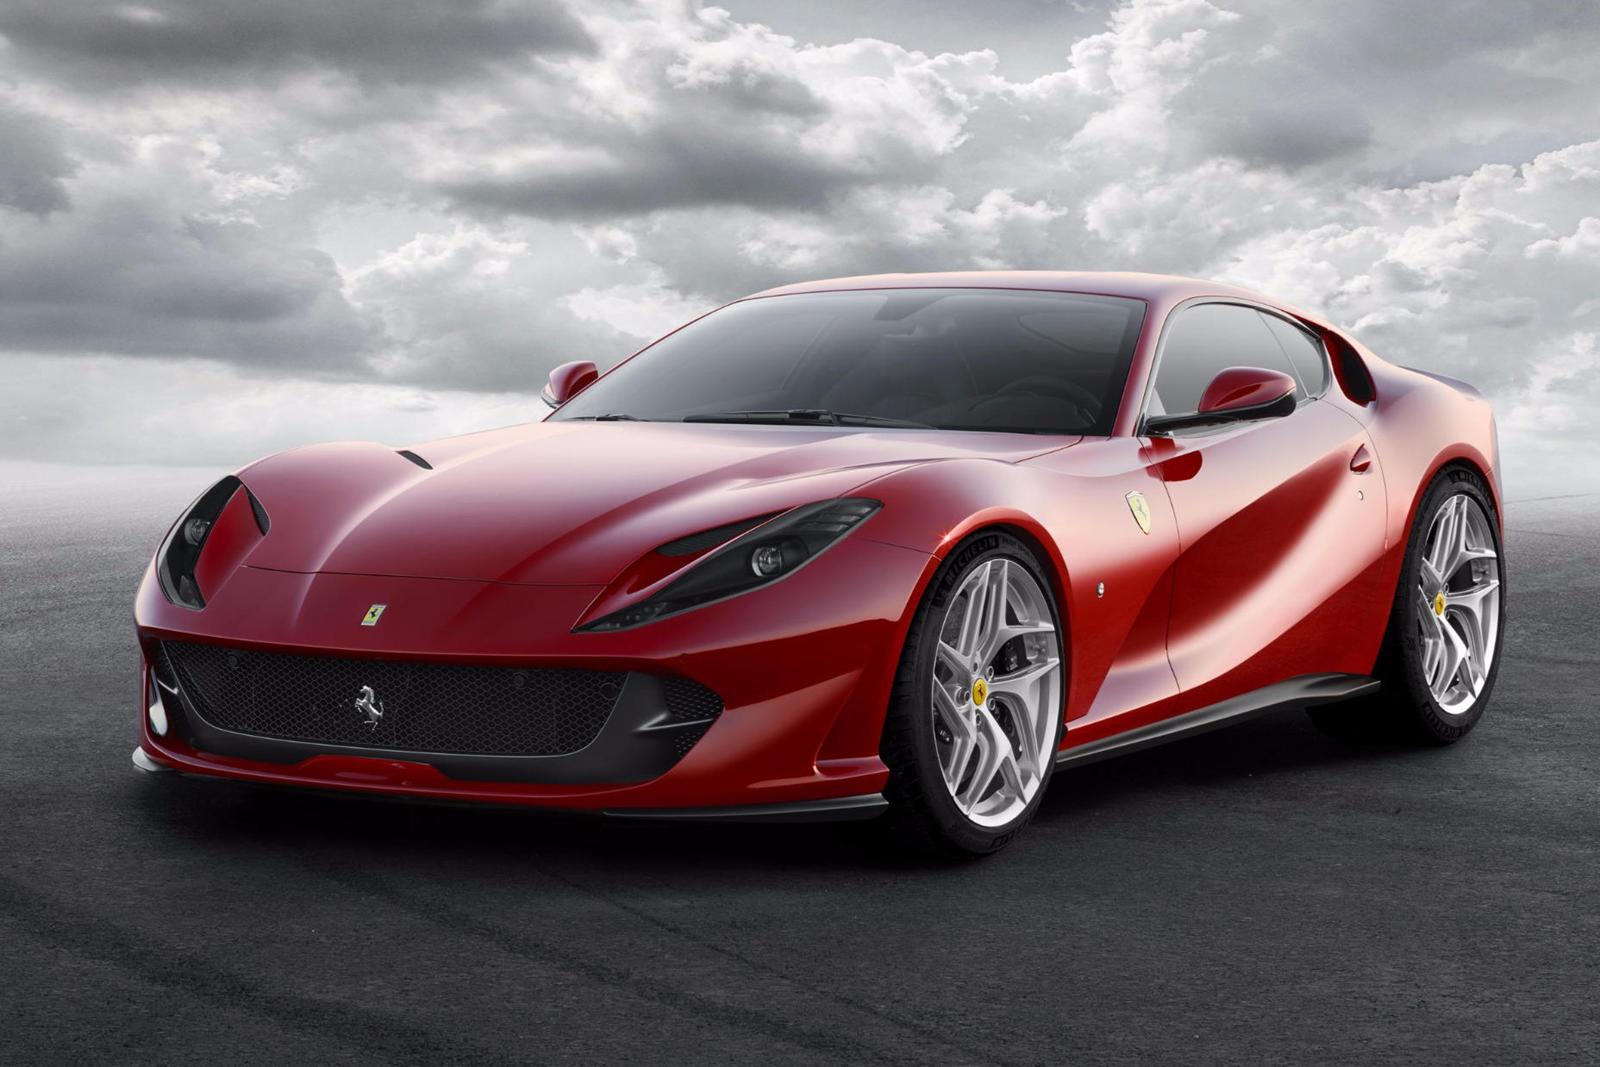 Ferrari 812 Superfast Review Trims Specs Price New Interior Features Exterior Design And Specifications Carbuzz